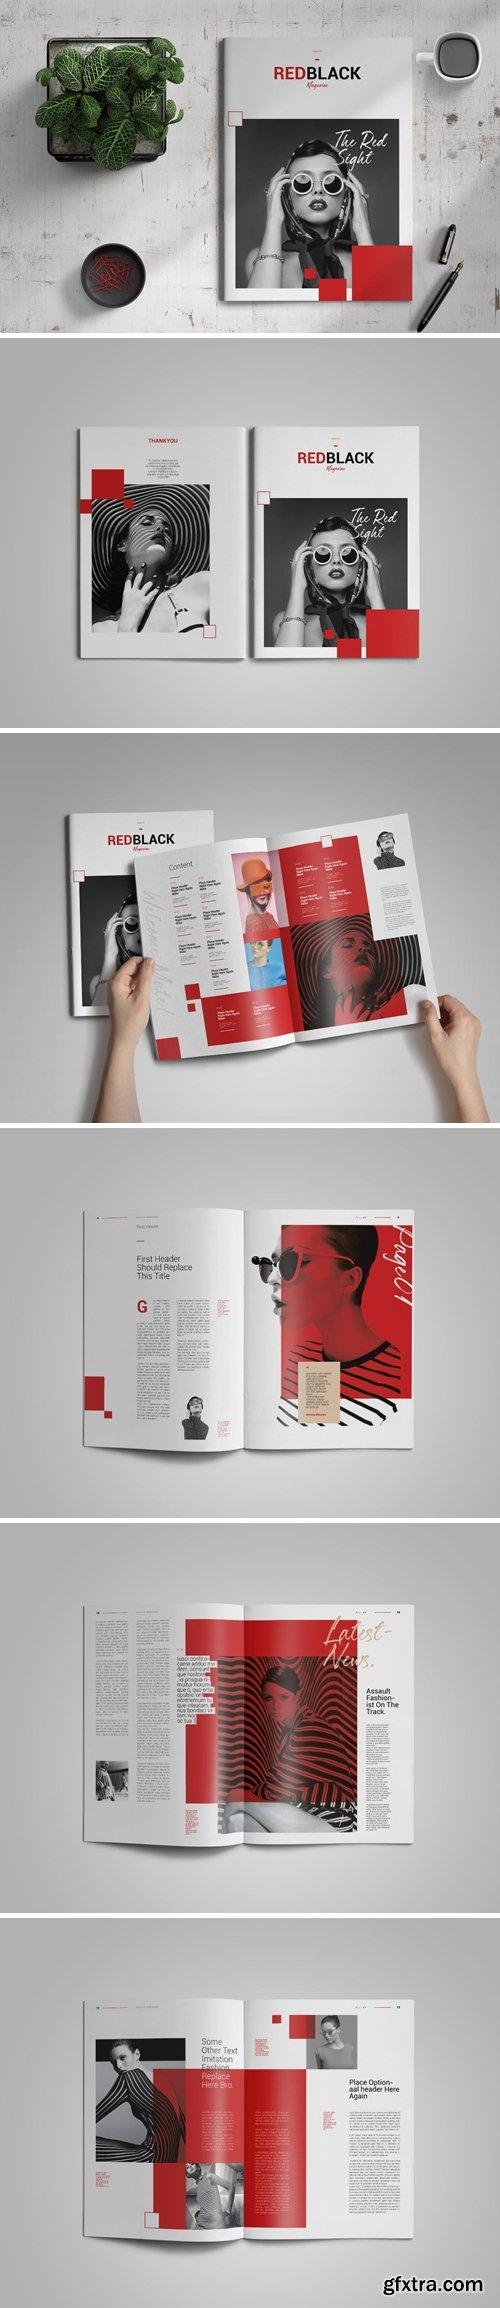 Redblack | Magazine template